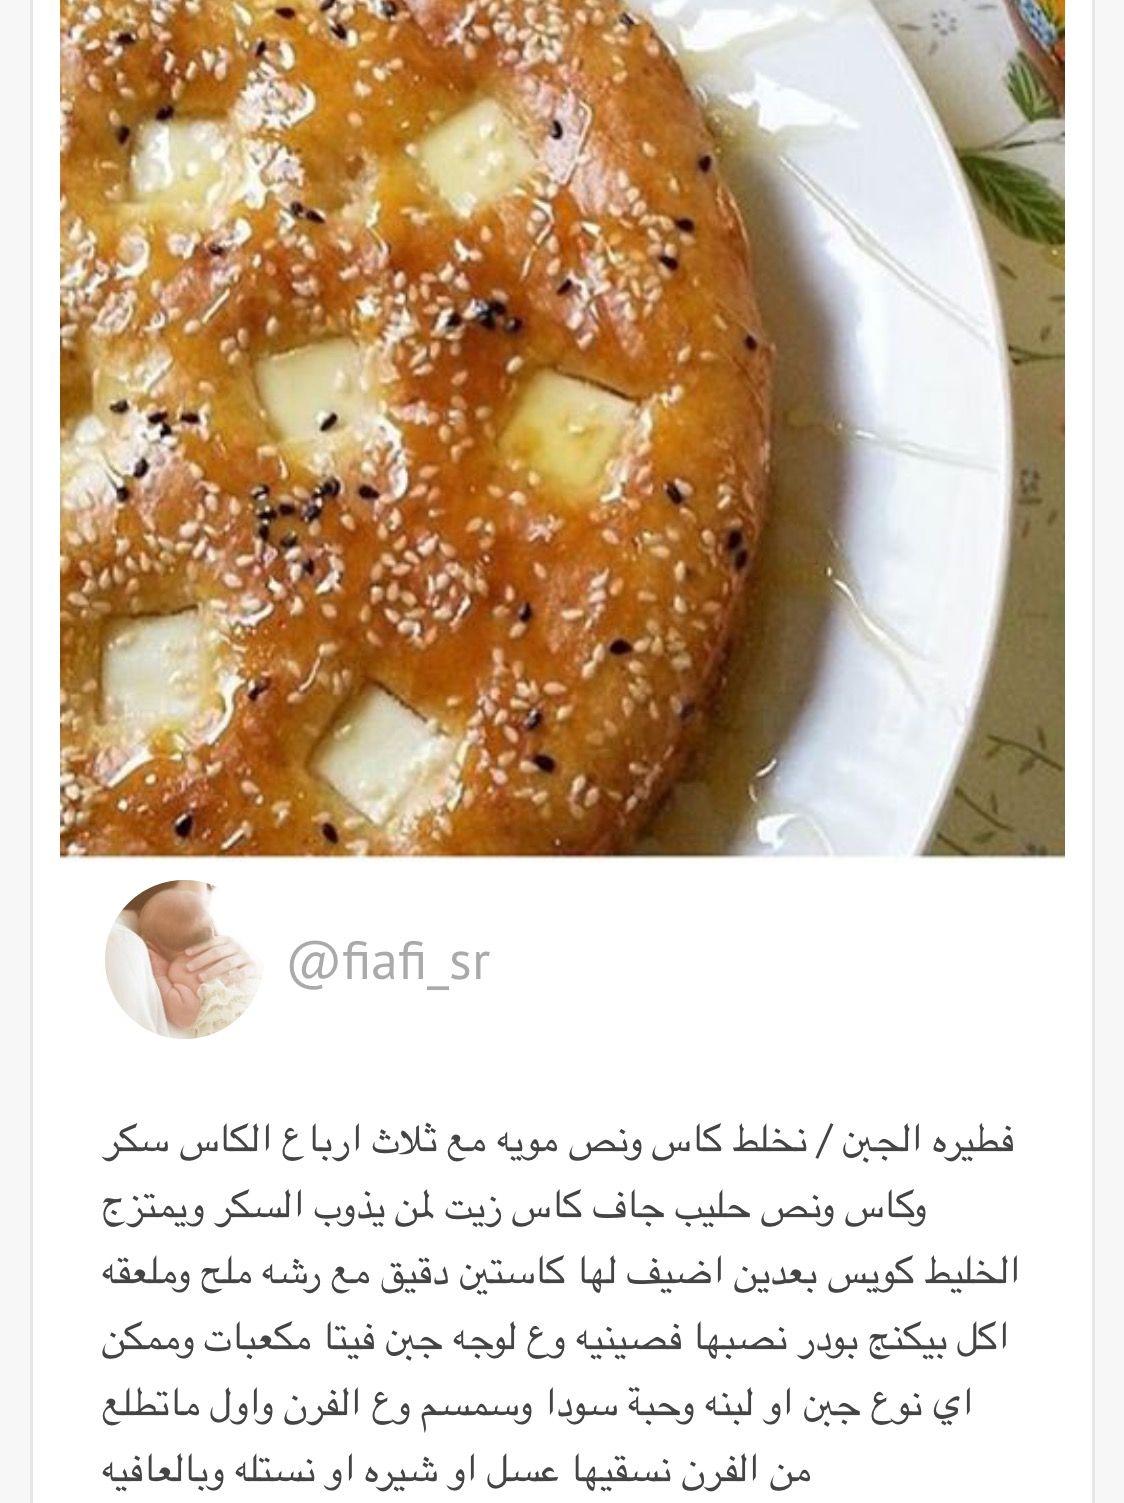 فطيرة الجبن Cooking Recipes Desserts Sweet Meat Arabic Food